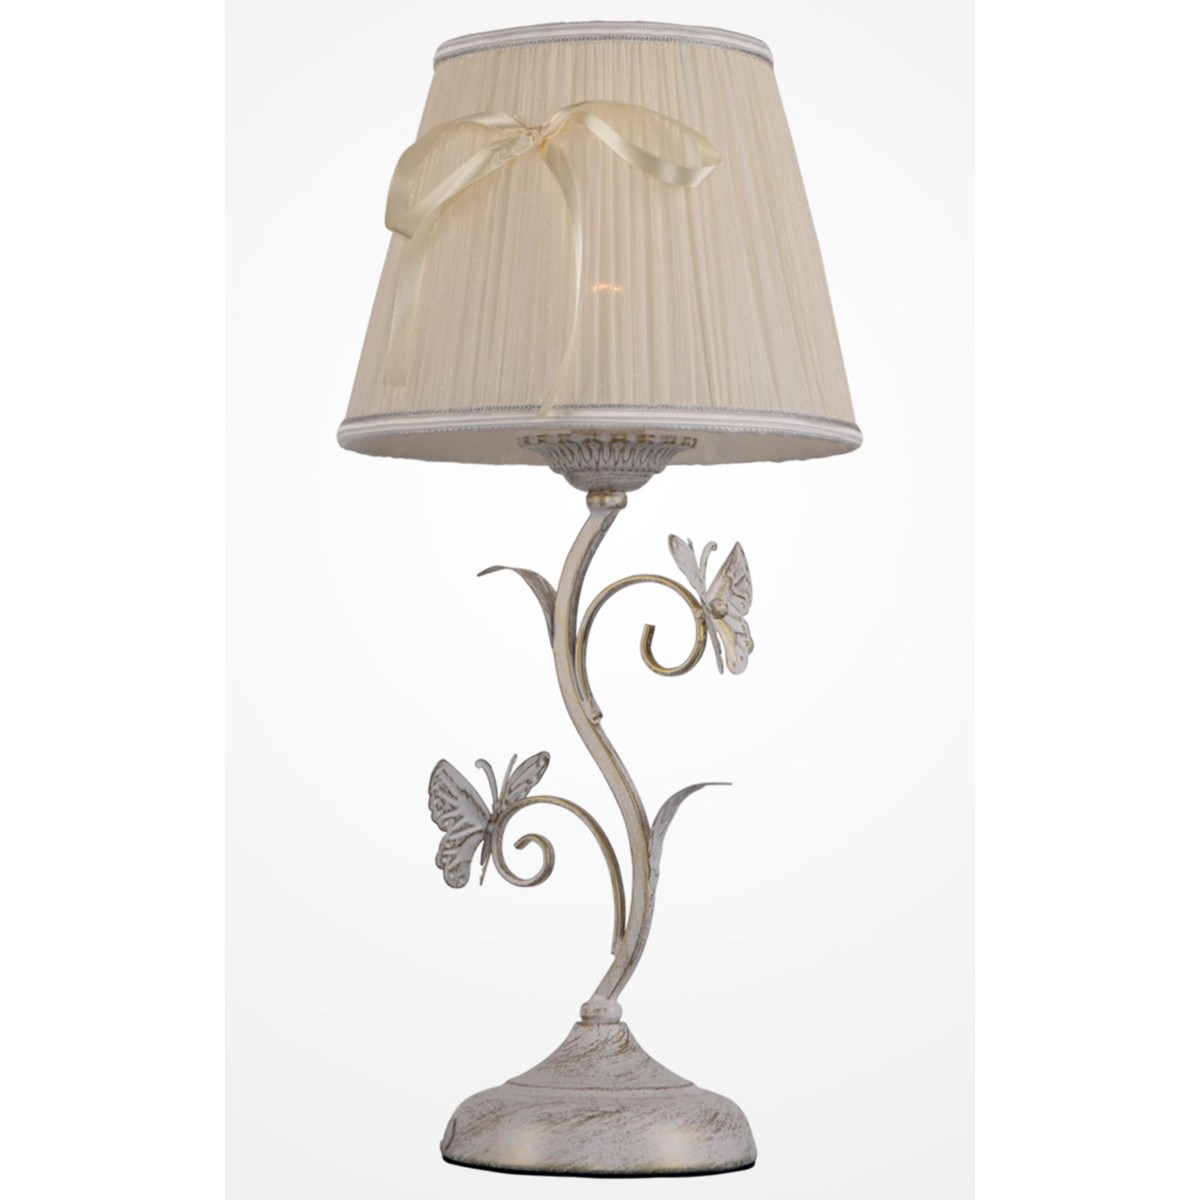 Лампа настольная рабочая Rivoli Fartalla Б0038413 цвет бежевый